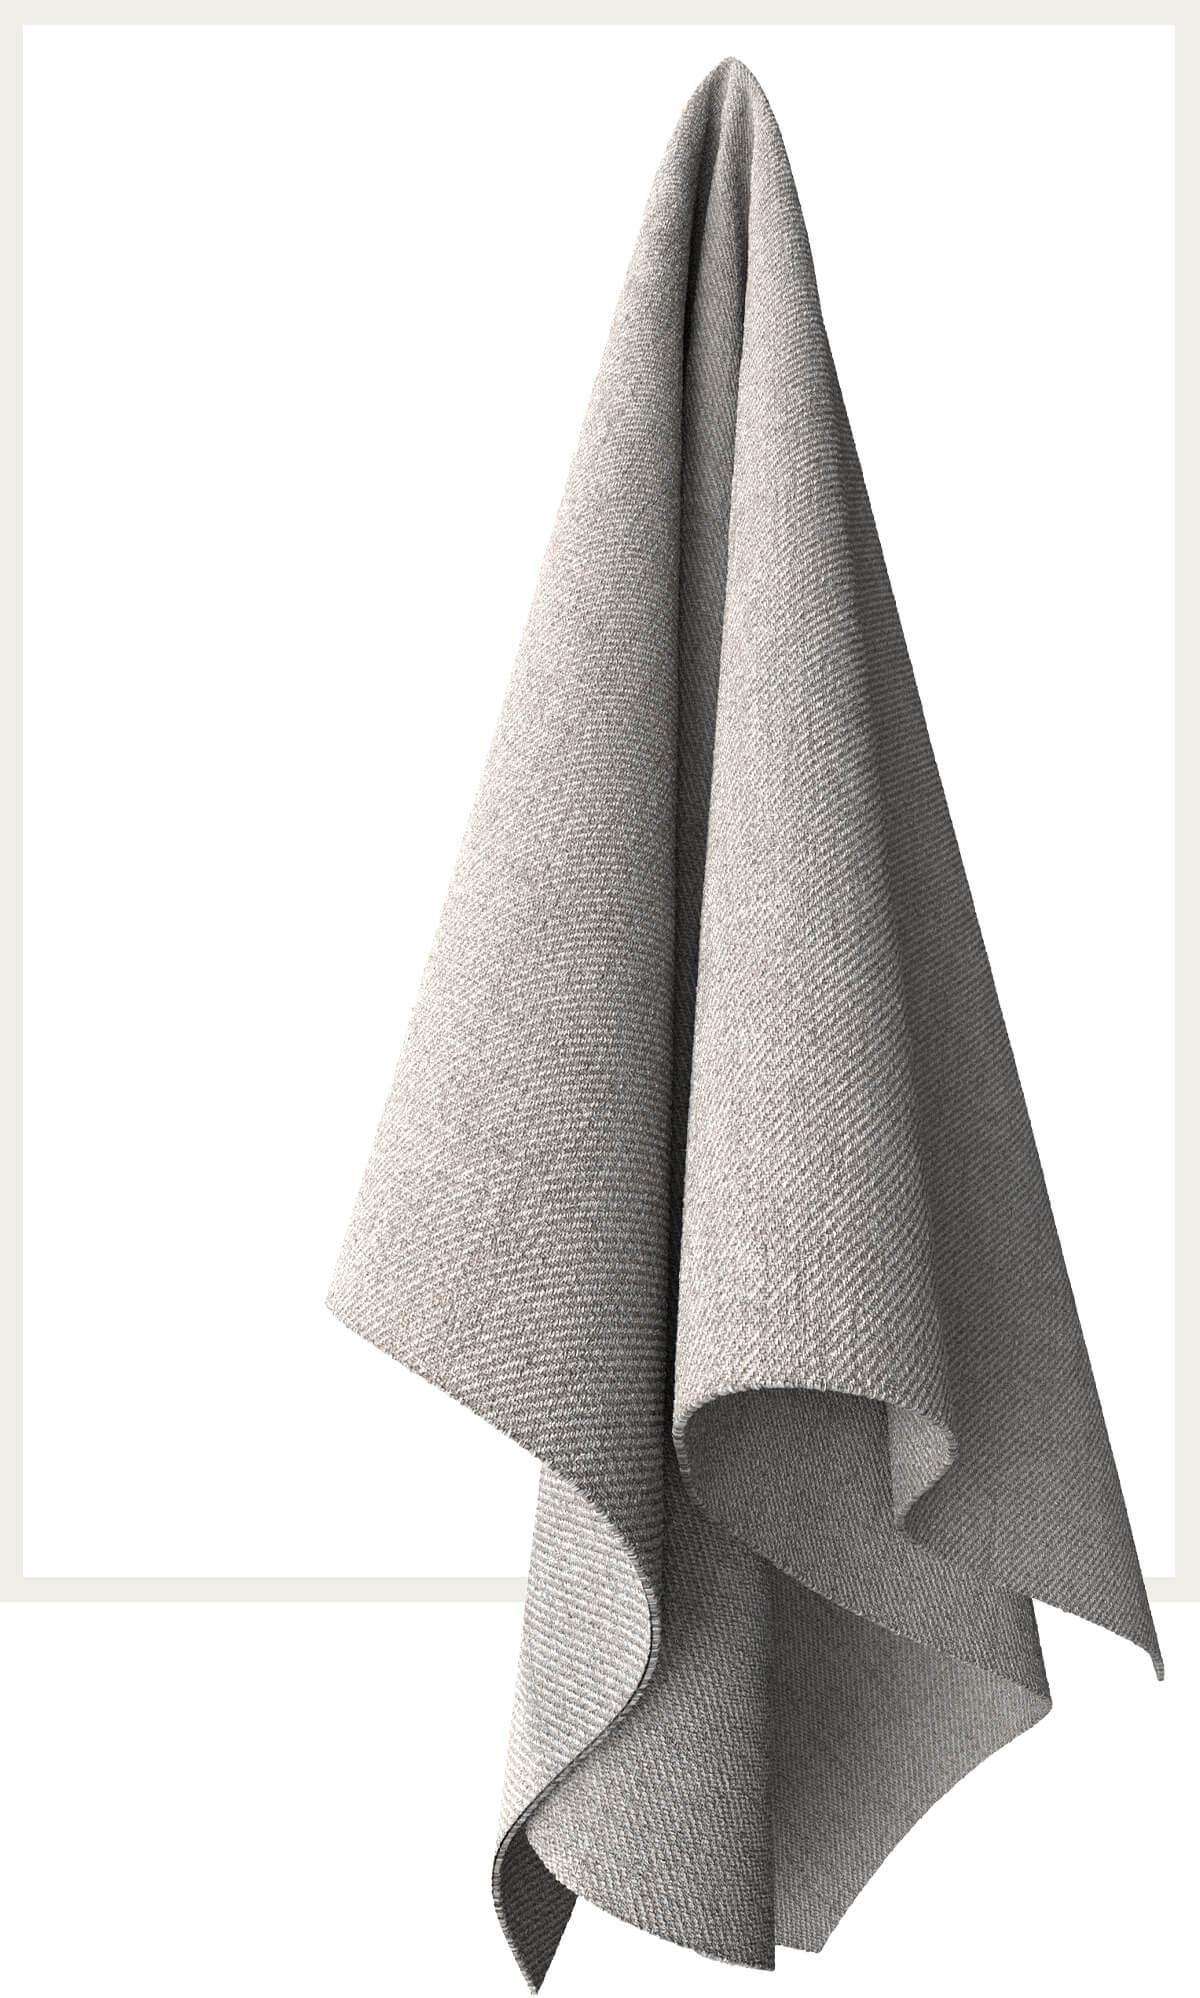 Strukturstoff Stripes Hellgrau